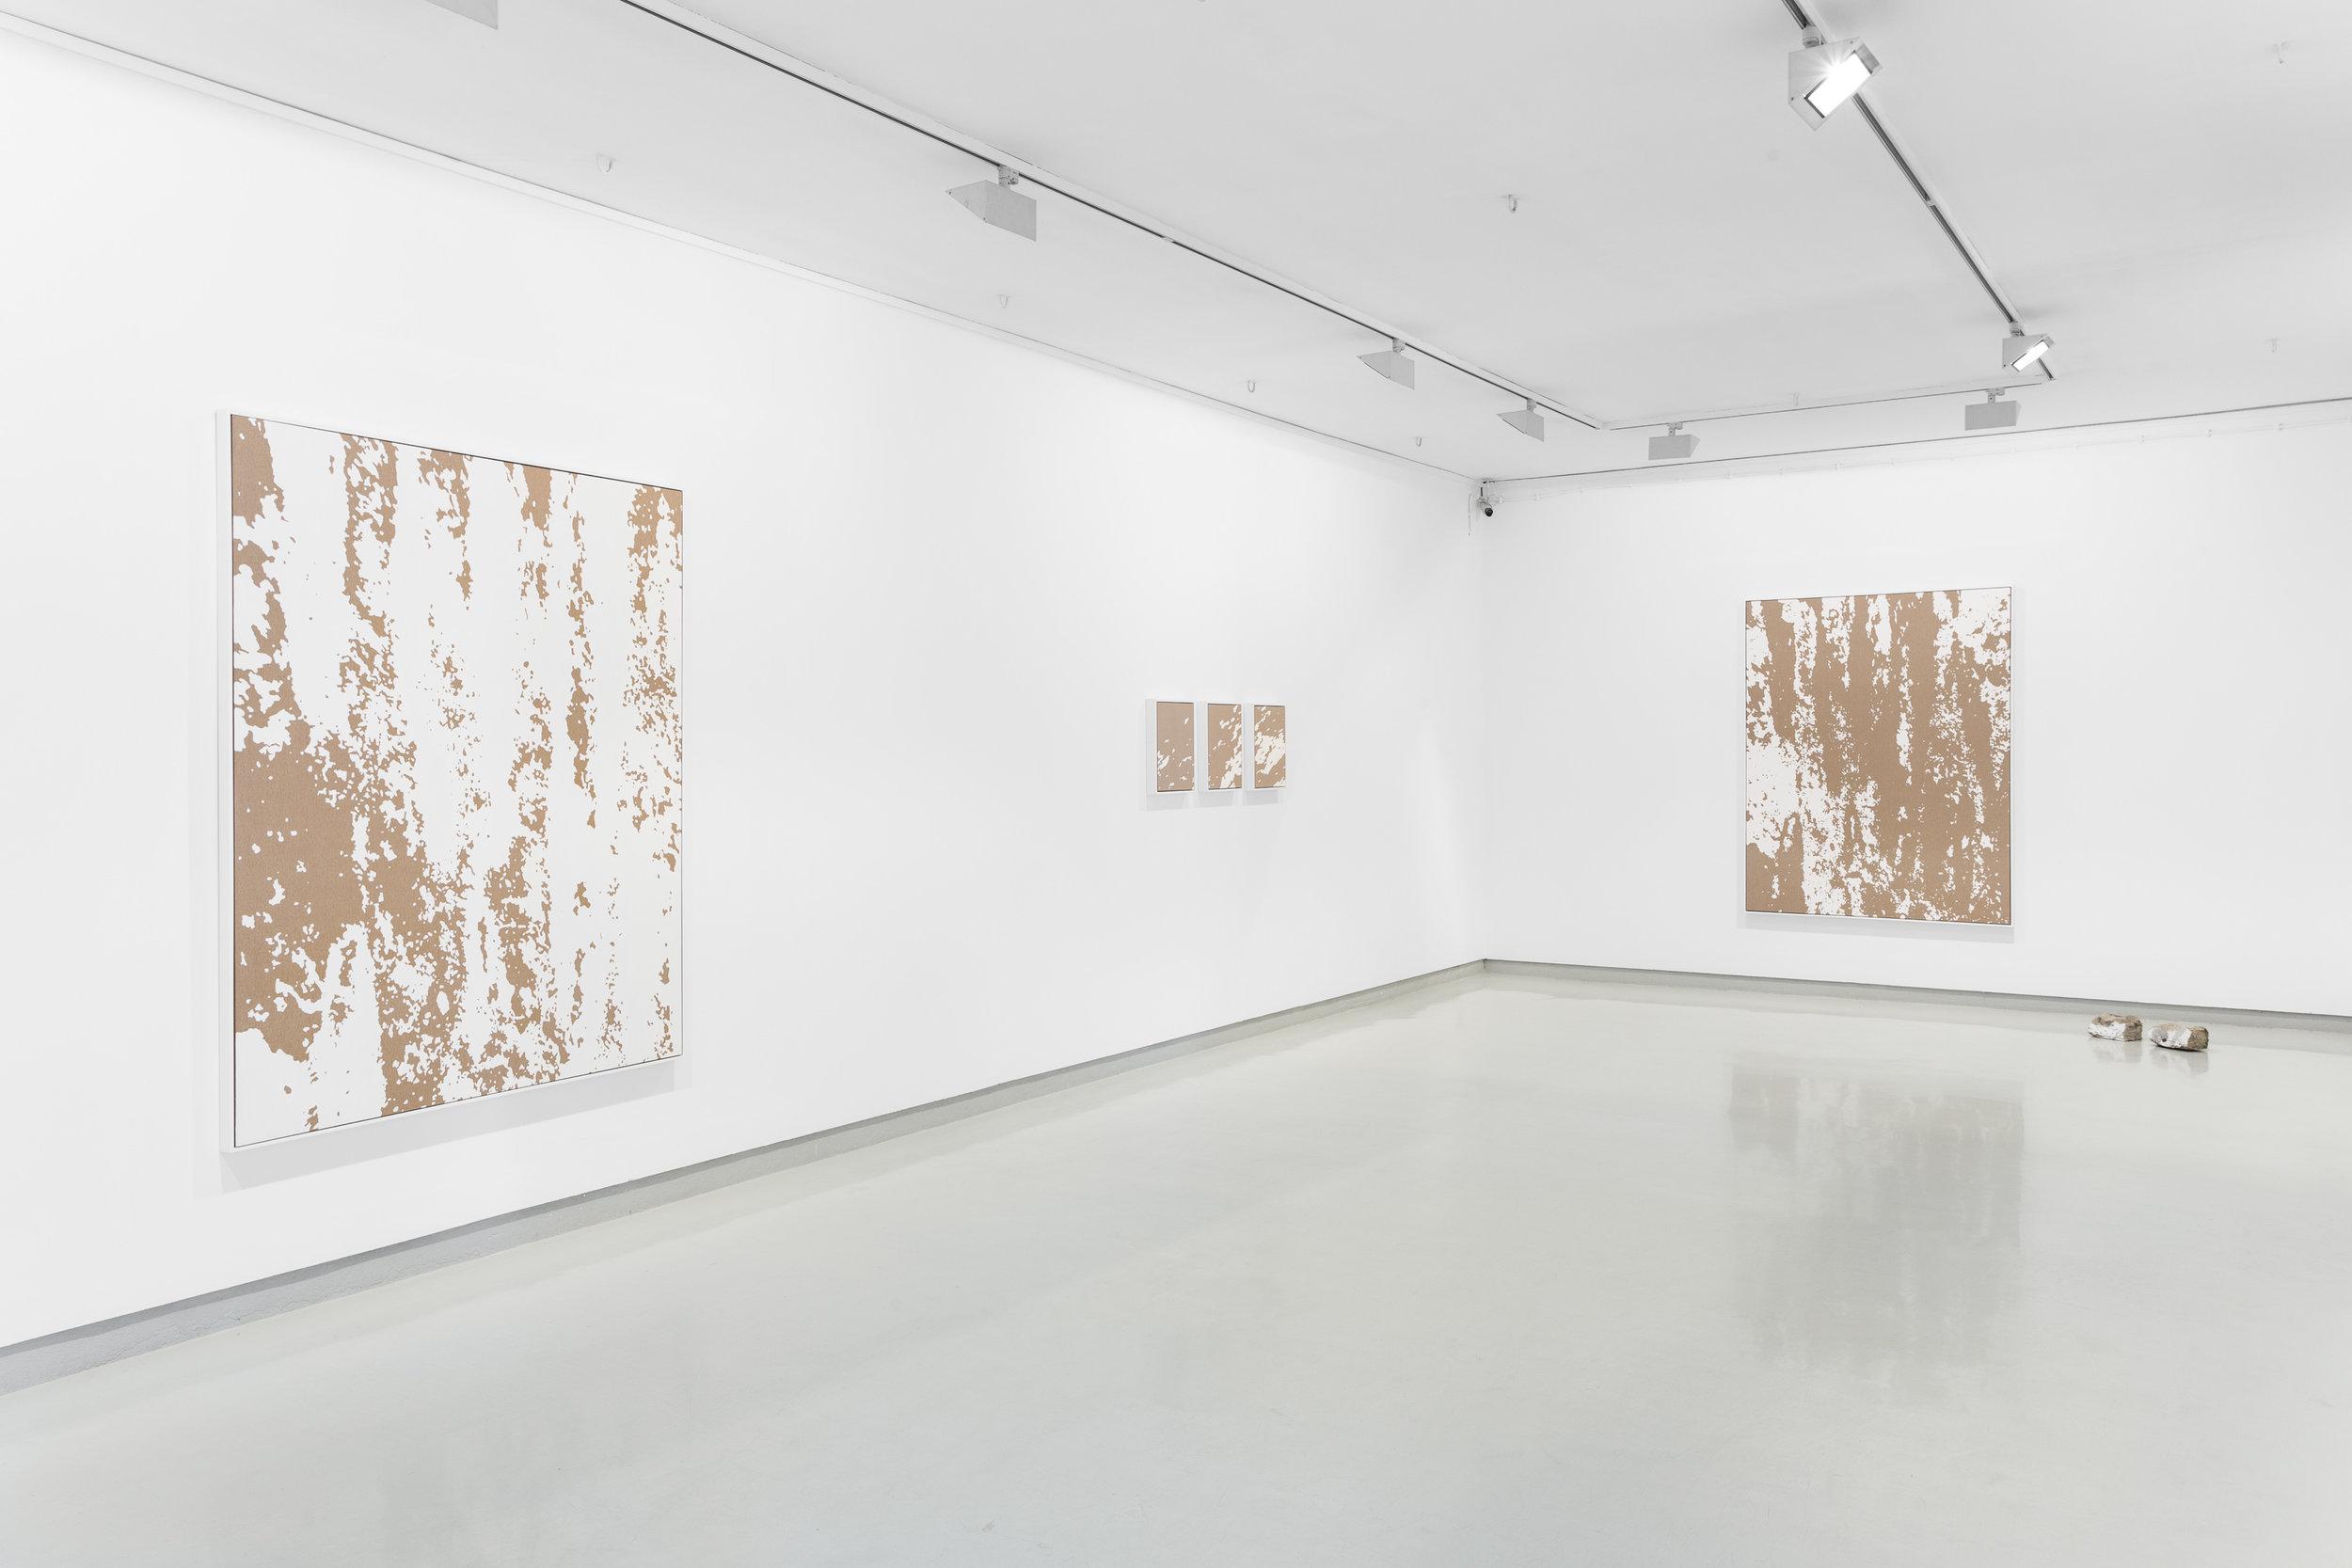 Installation view Pedro Matos,  Less Than Objects , Galeria Presença, Porto, Portugal, 2016 Photo by Bruno Lopes.